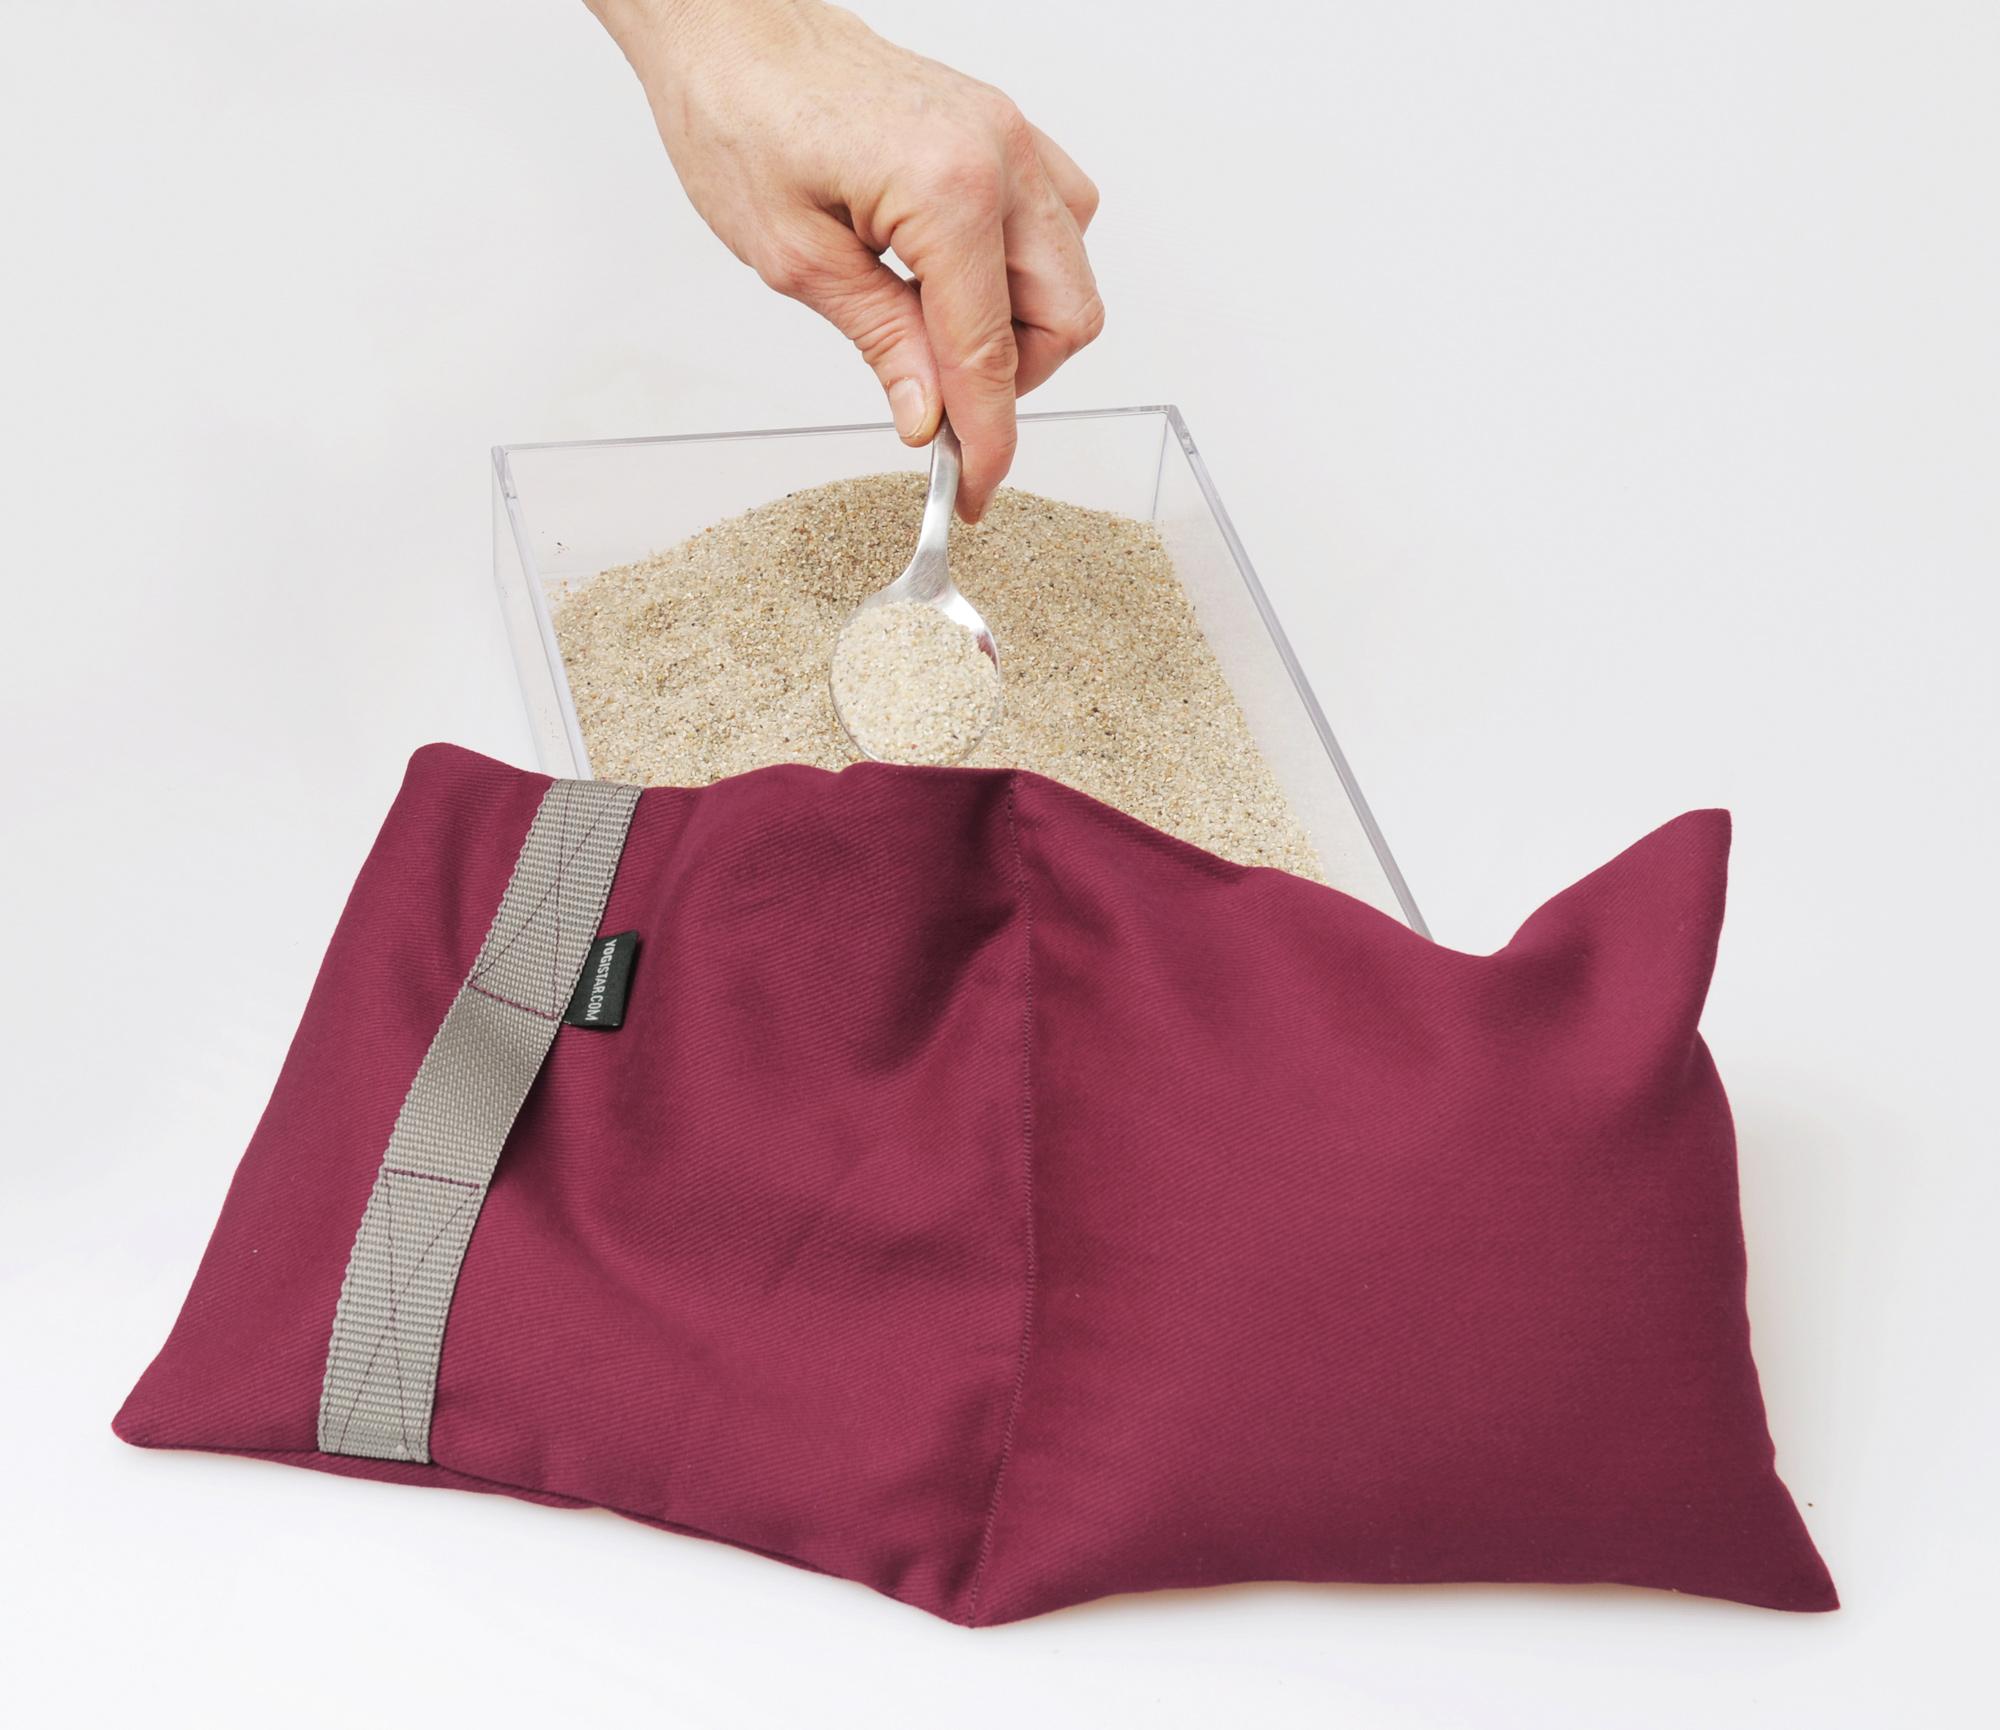 Yoga-Sandsack - 4 kg